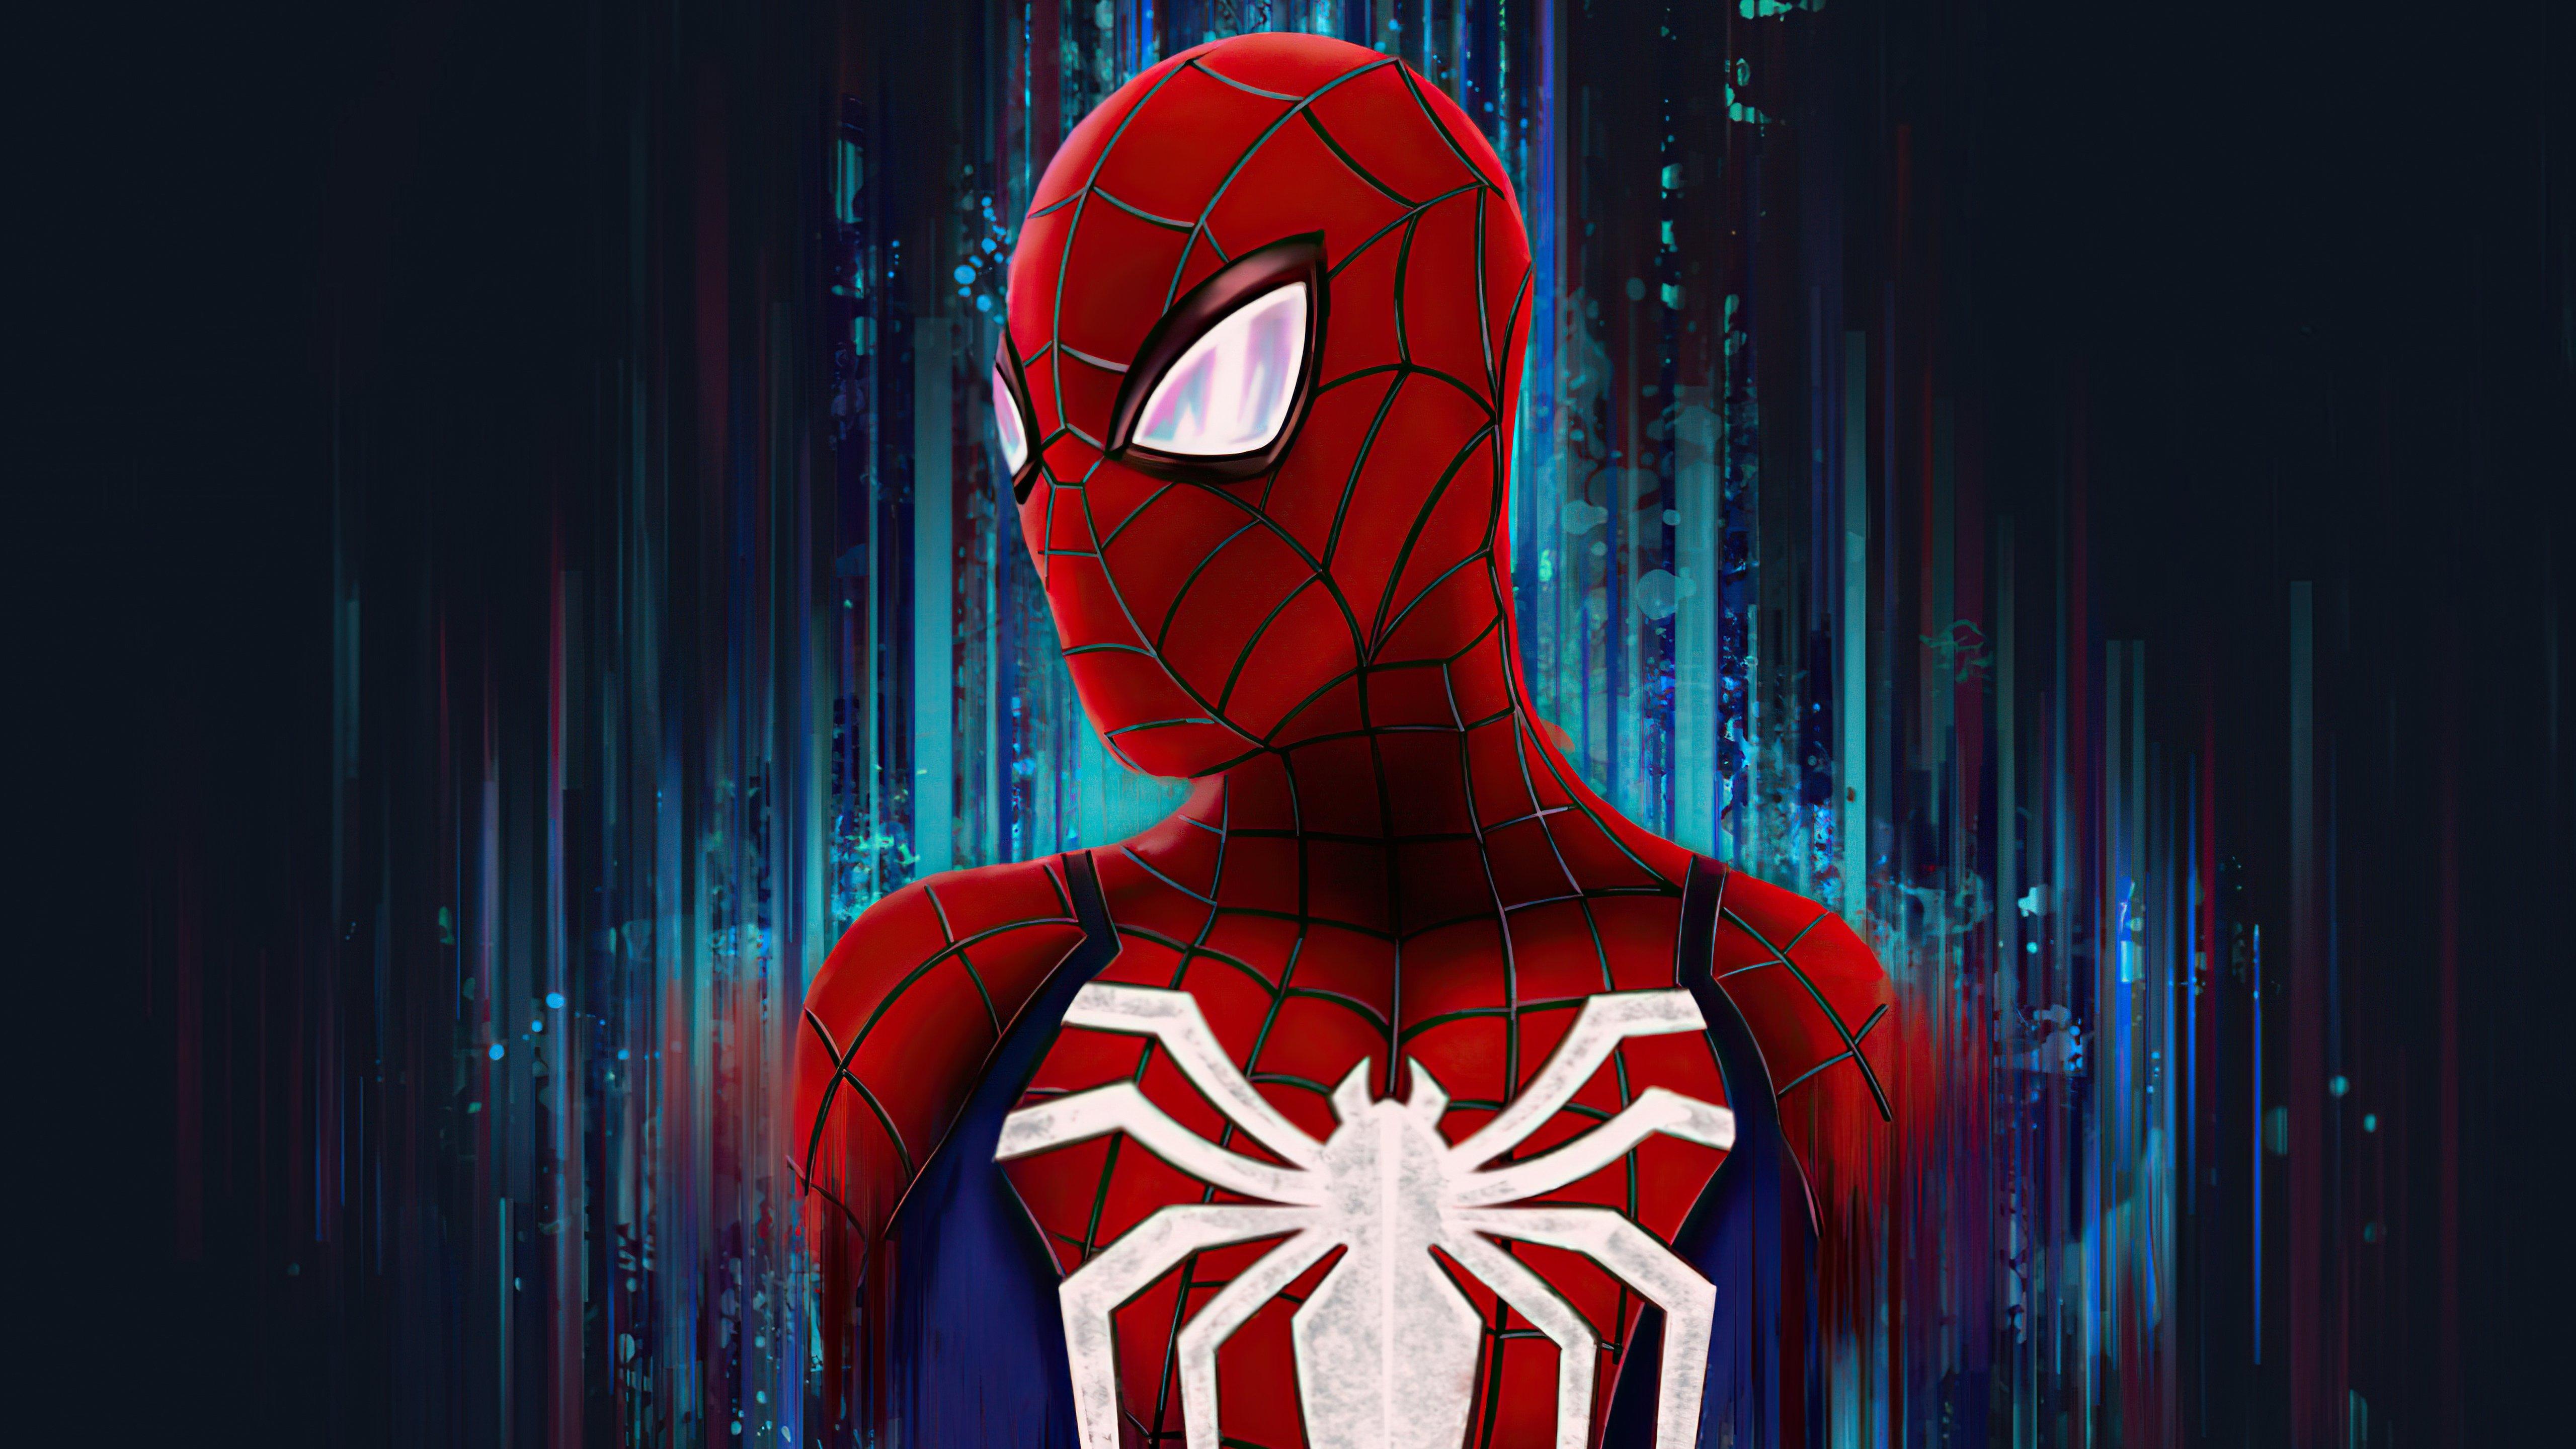 Fondos de pantalla Spiderman Fanart